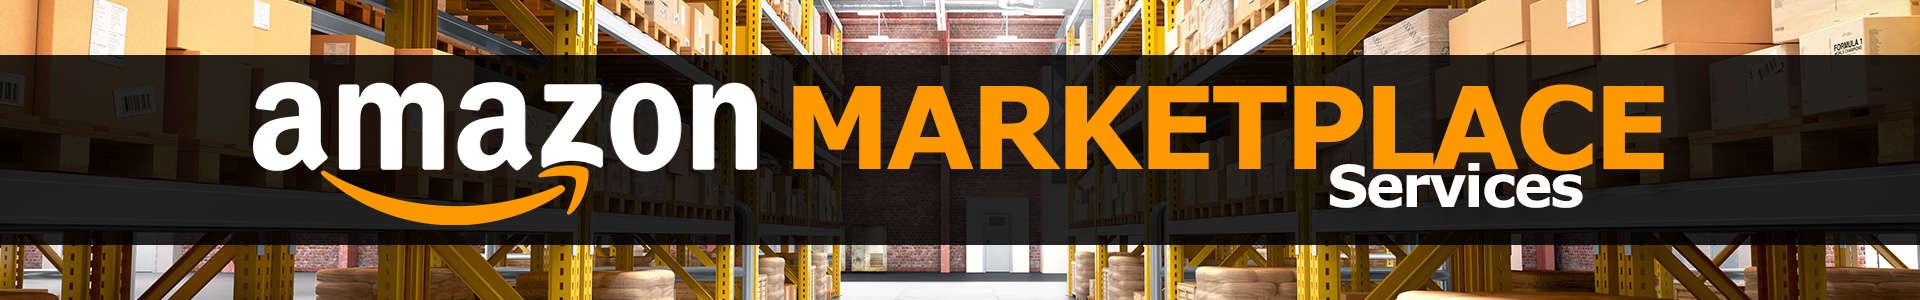 Amazon Marketplace Services